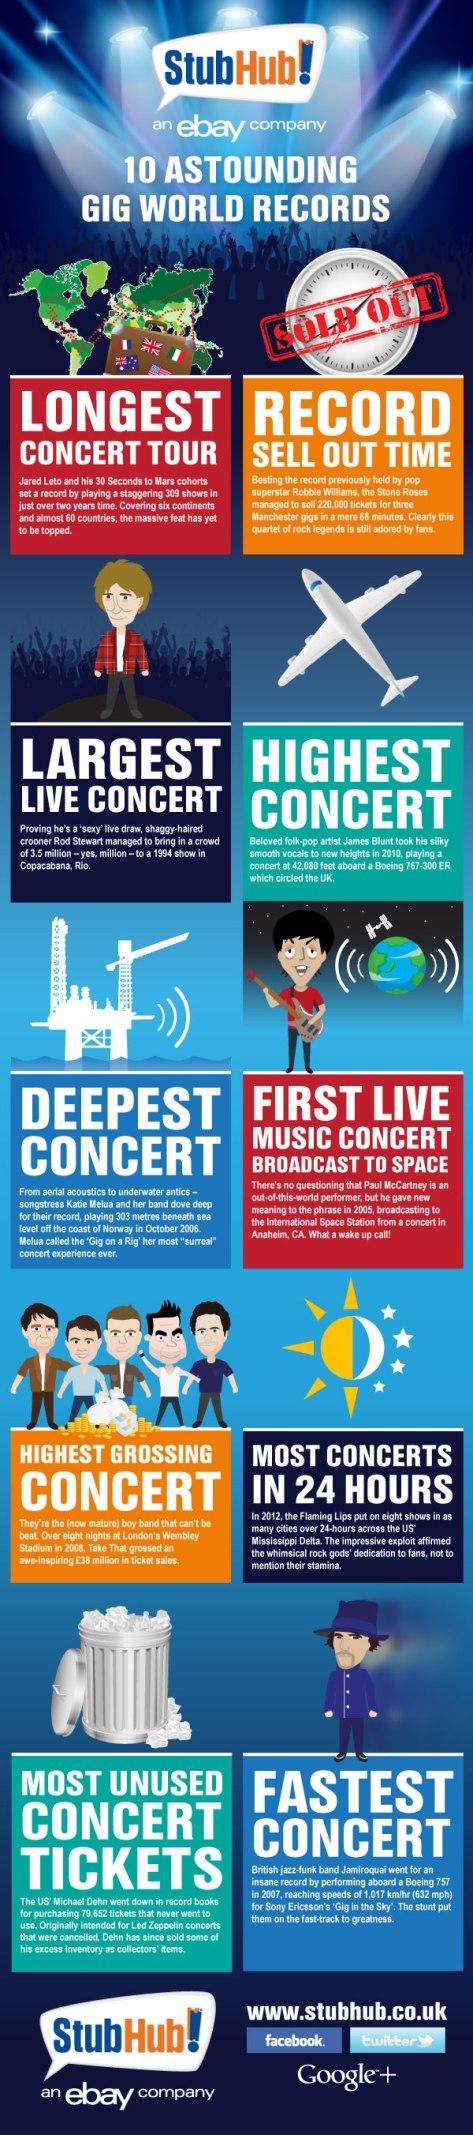 10 astounding gig world records